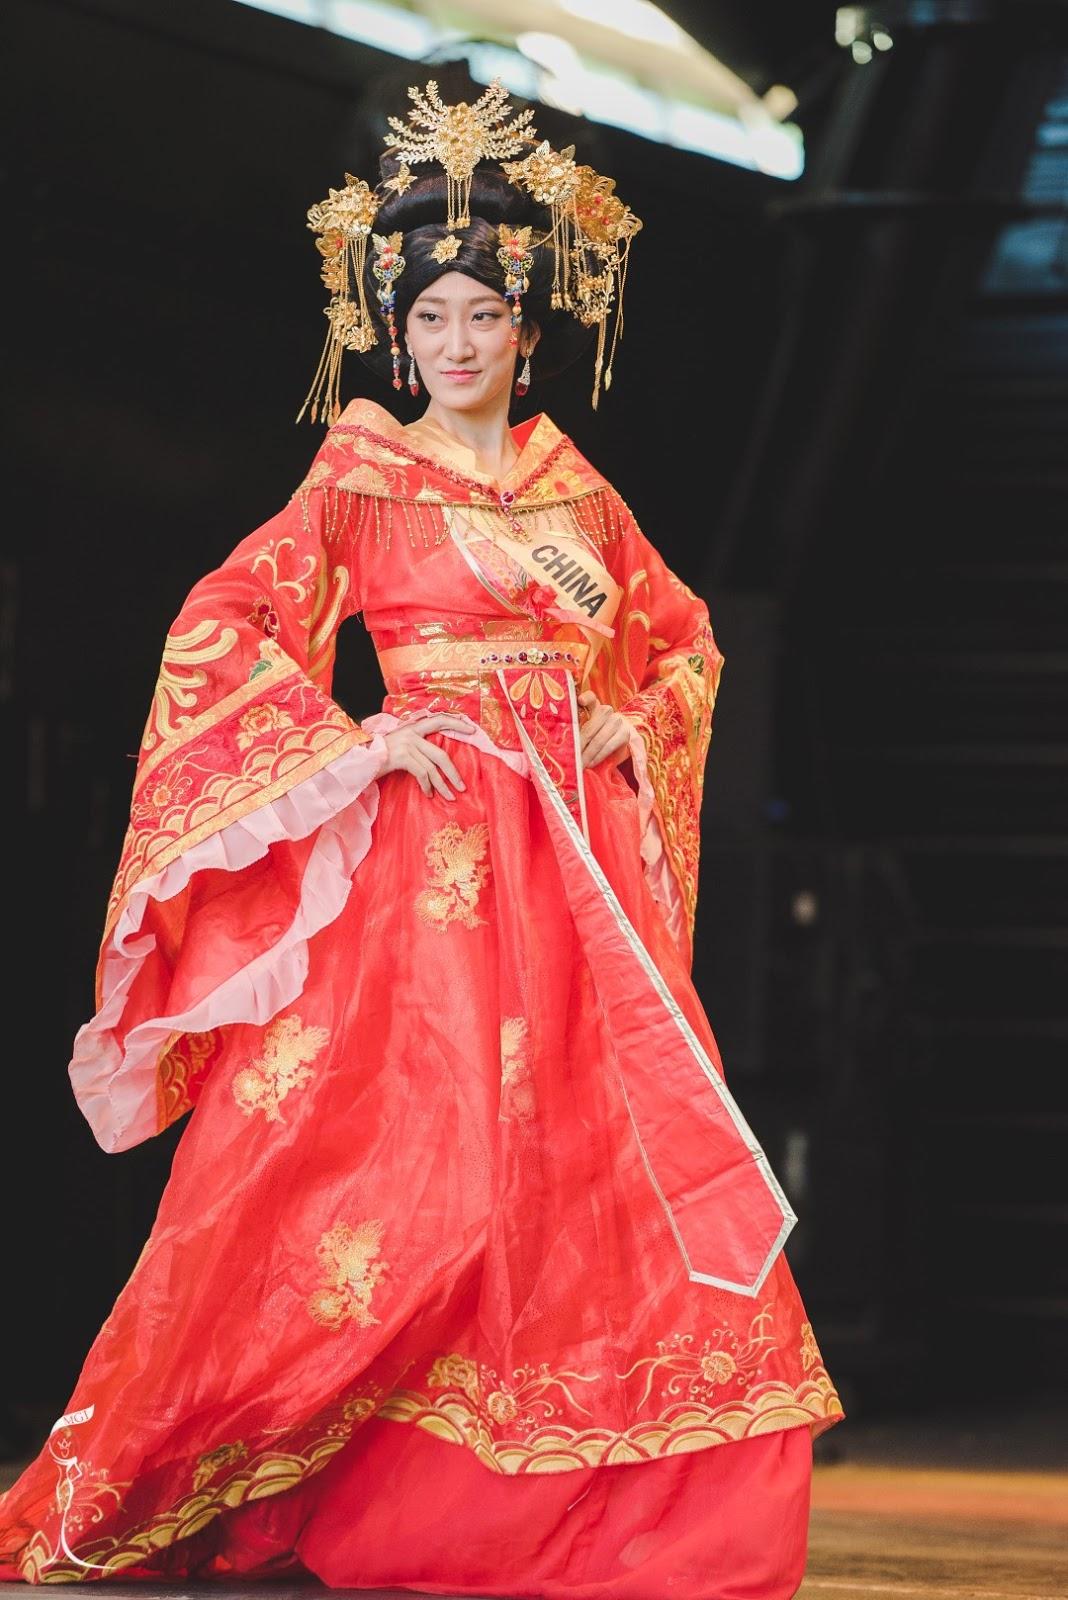 Parade of Grand Costumes in 2016 Miss Grand International Asia  sc 1 st  clustereum & CLUSTEREUM: Parade of Grand Costumes in 2016 Miss Grand ...